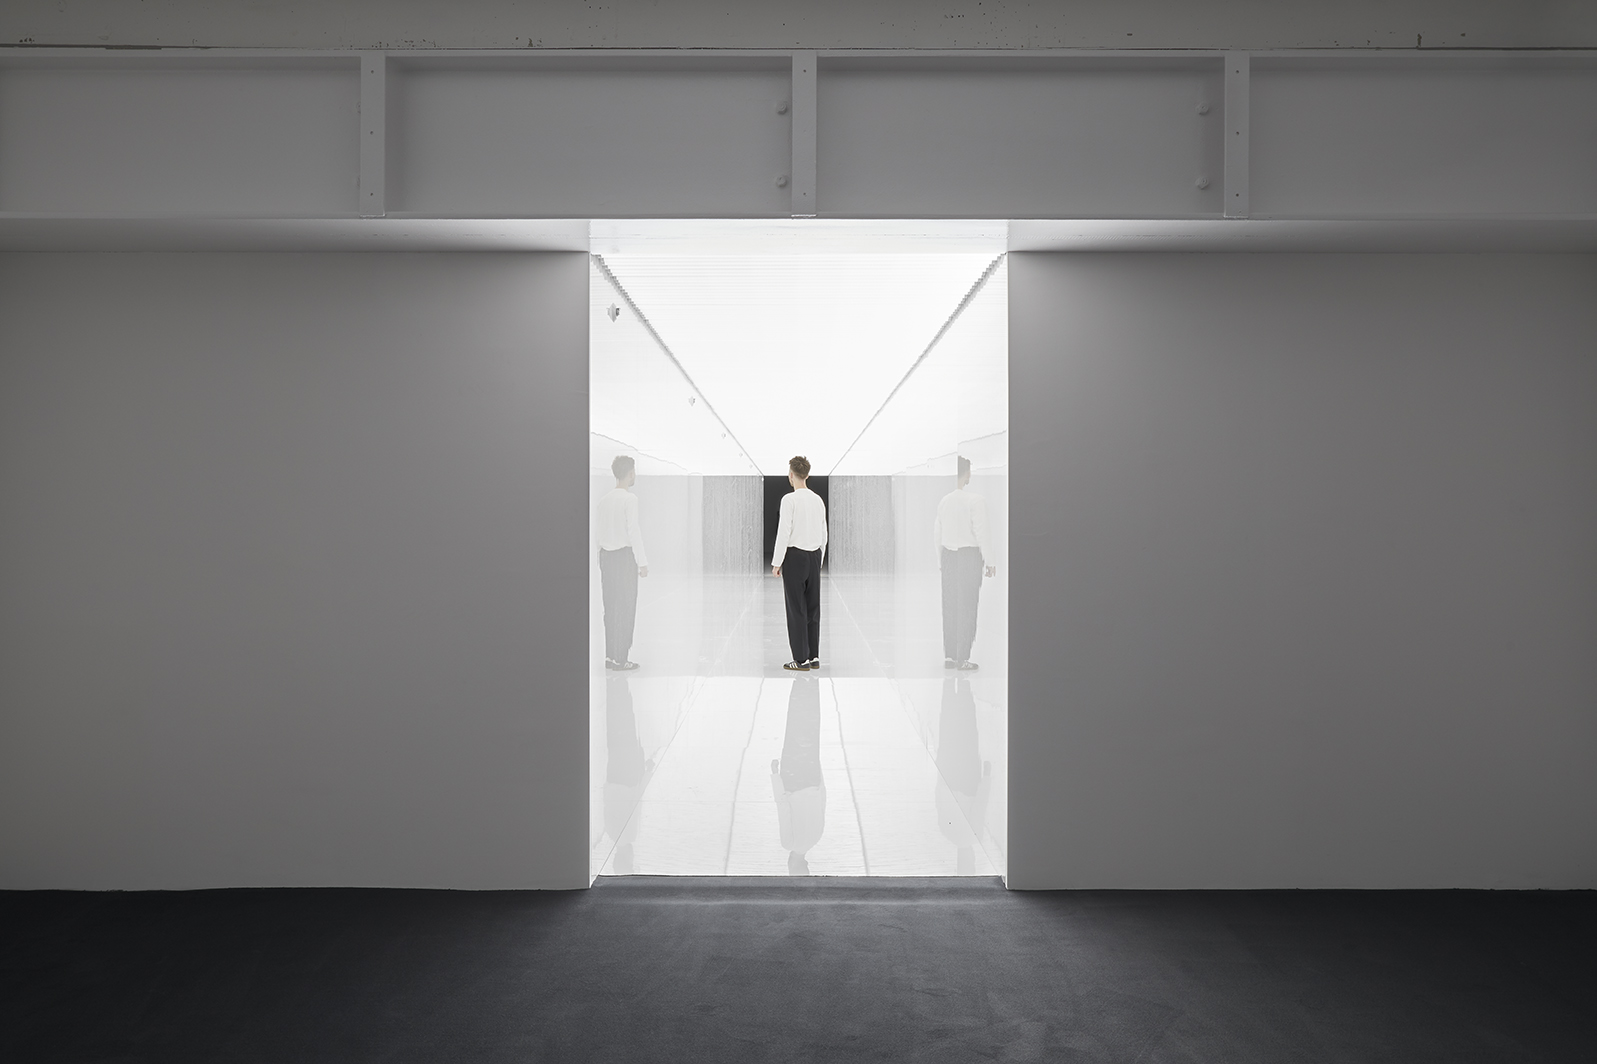 Installation view Ryoji Ikeda at 180 Studios, 180 The Strand